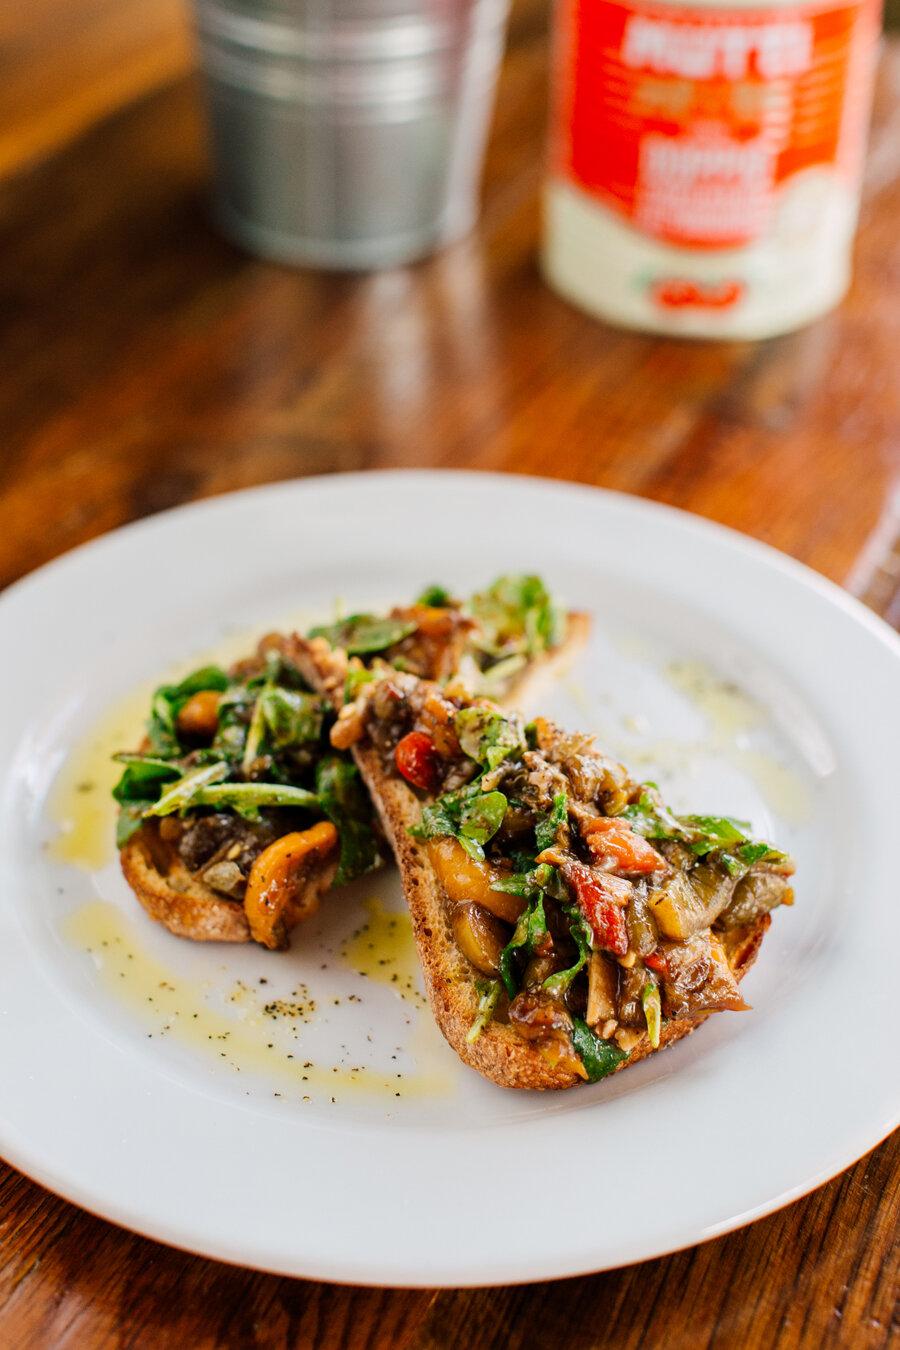 016-Seattle-food-photographer-katheryn-moran-due-cucina-italiana-pasta.jpg